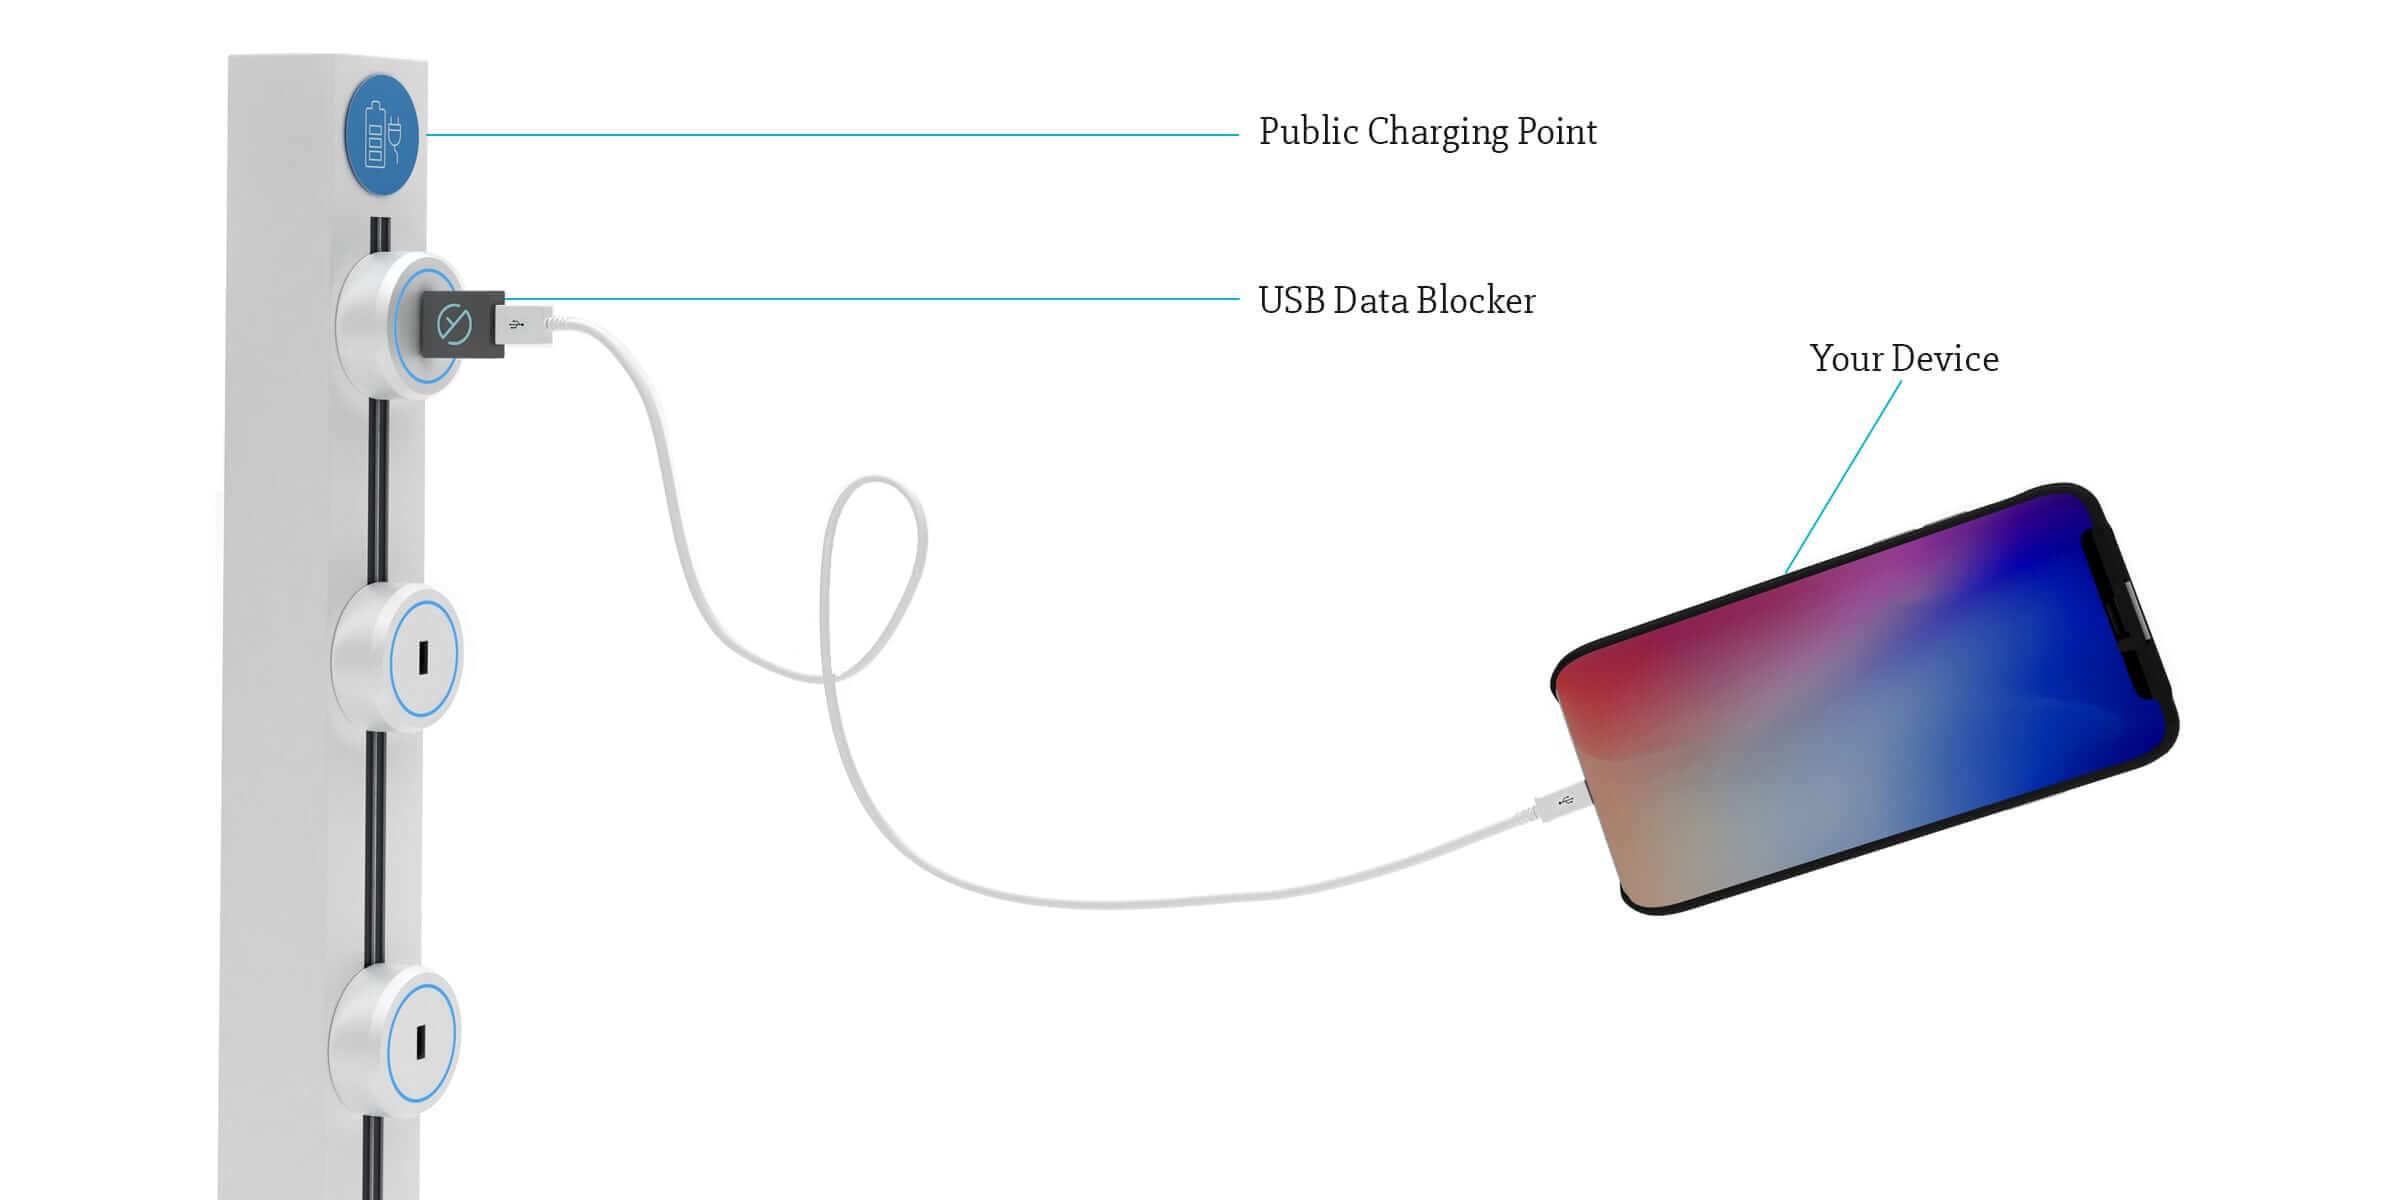 How does a USB data blocker work